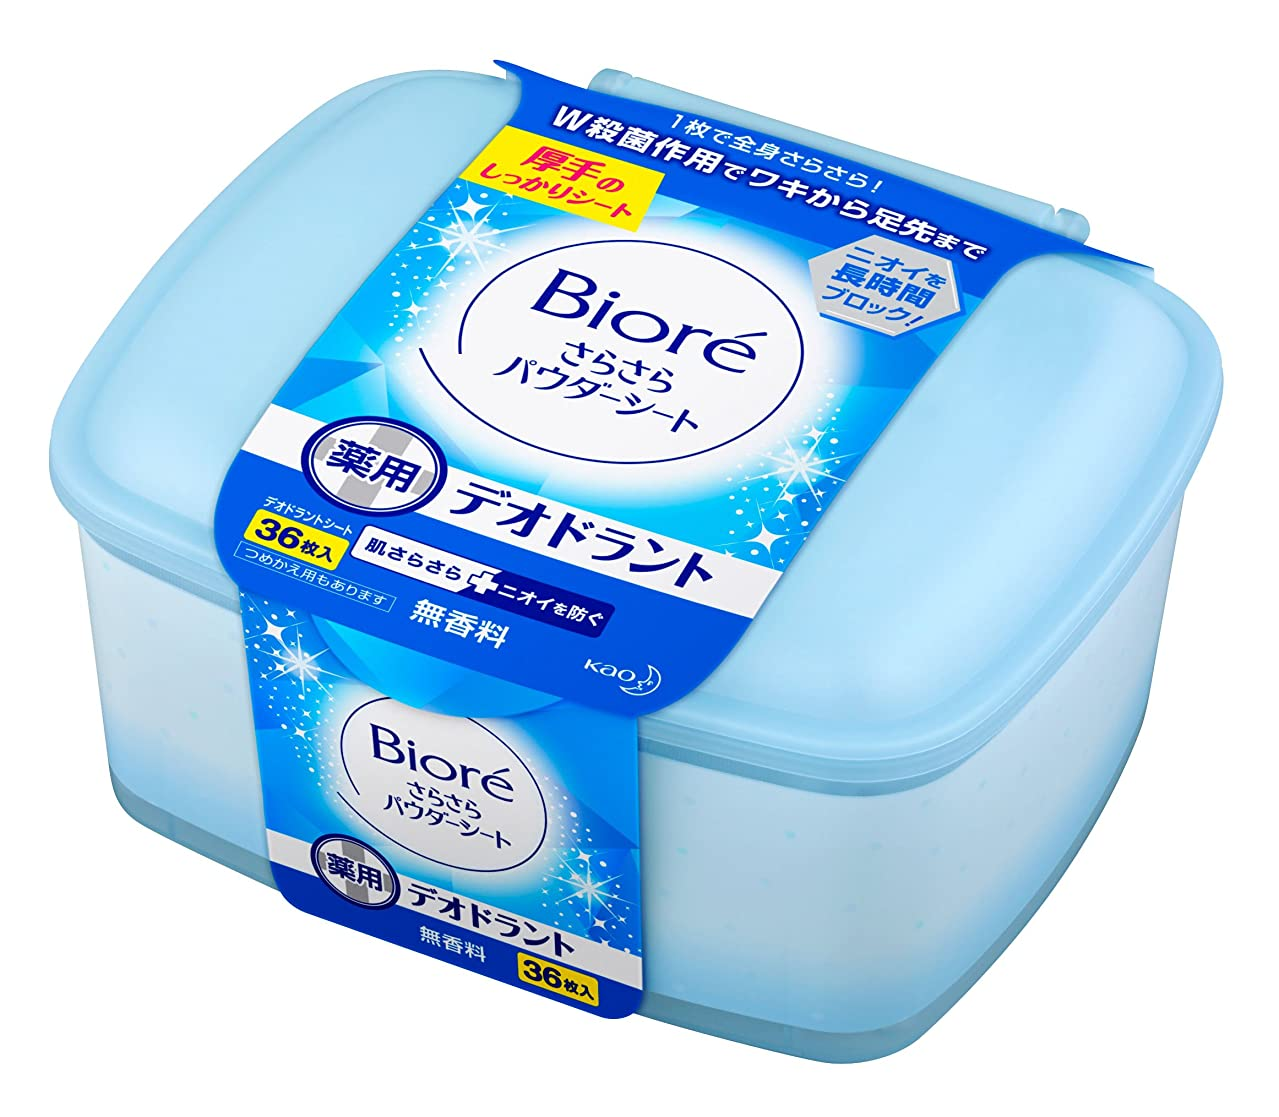 Kao Biore Sarasara Powder Sheets   Skin Care Cleansing Cloth   Deodorantet 36 Sheets No Fragrance